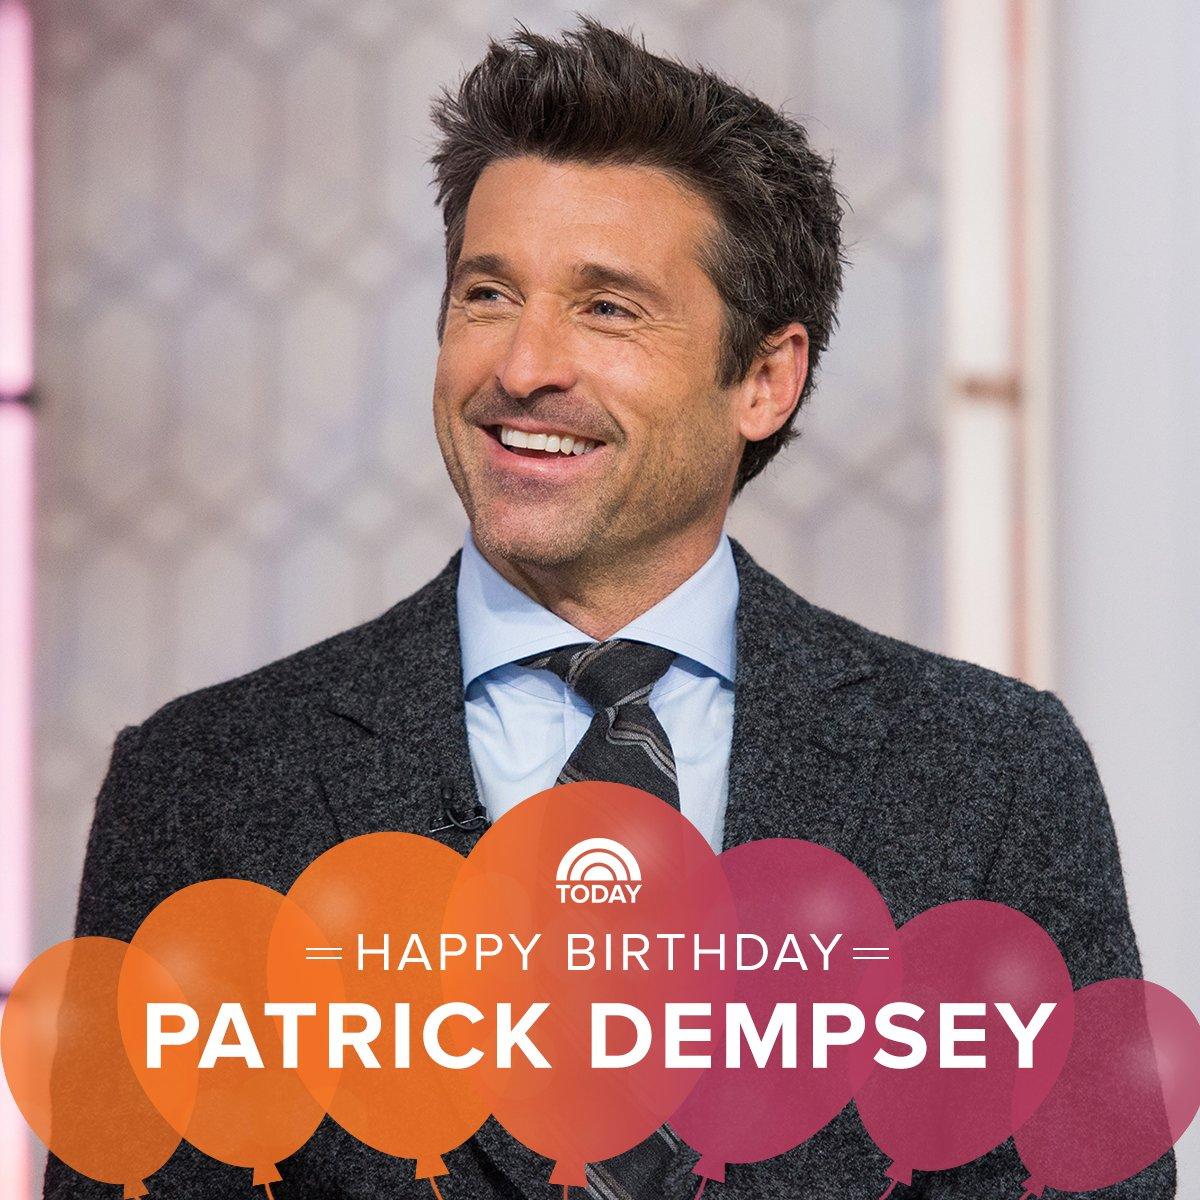 Happy birthday, Patrick Dempsey!